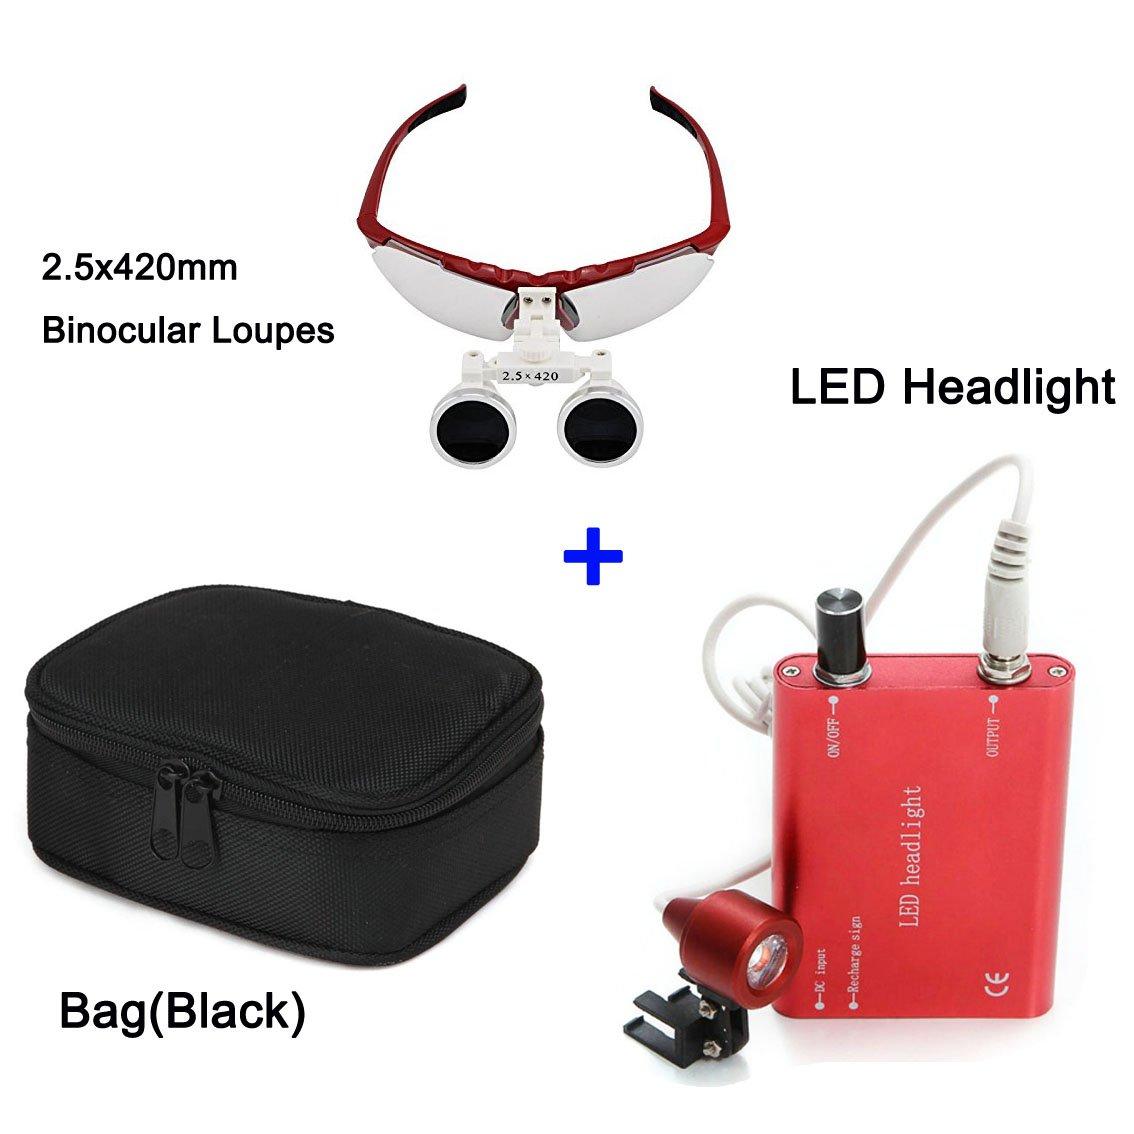 Zinnor 2.5 X 420mm Dental Surgical Medical Binocular Loupes Optical Glass Loupe + LED Head Light Lamp(Red) + Carry Bag(Black)